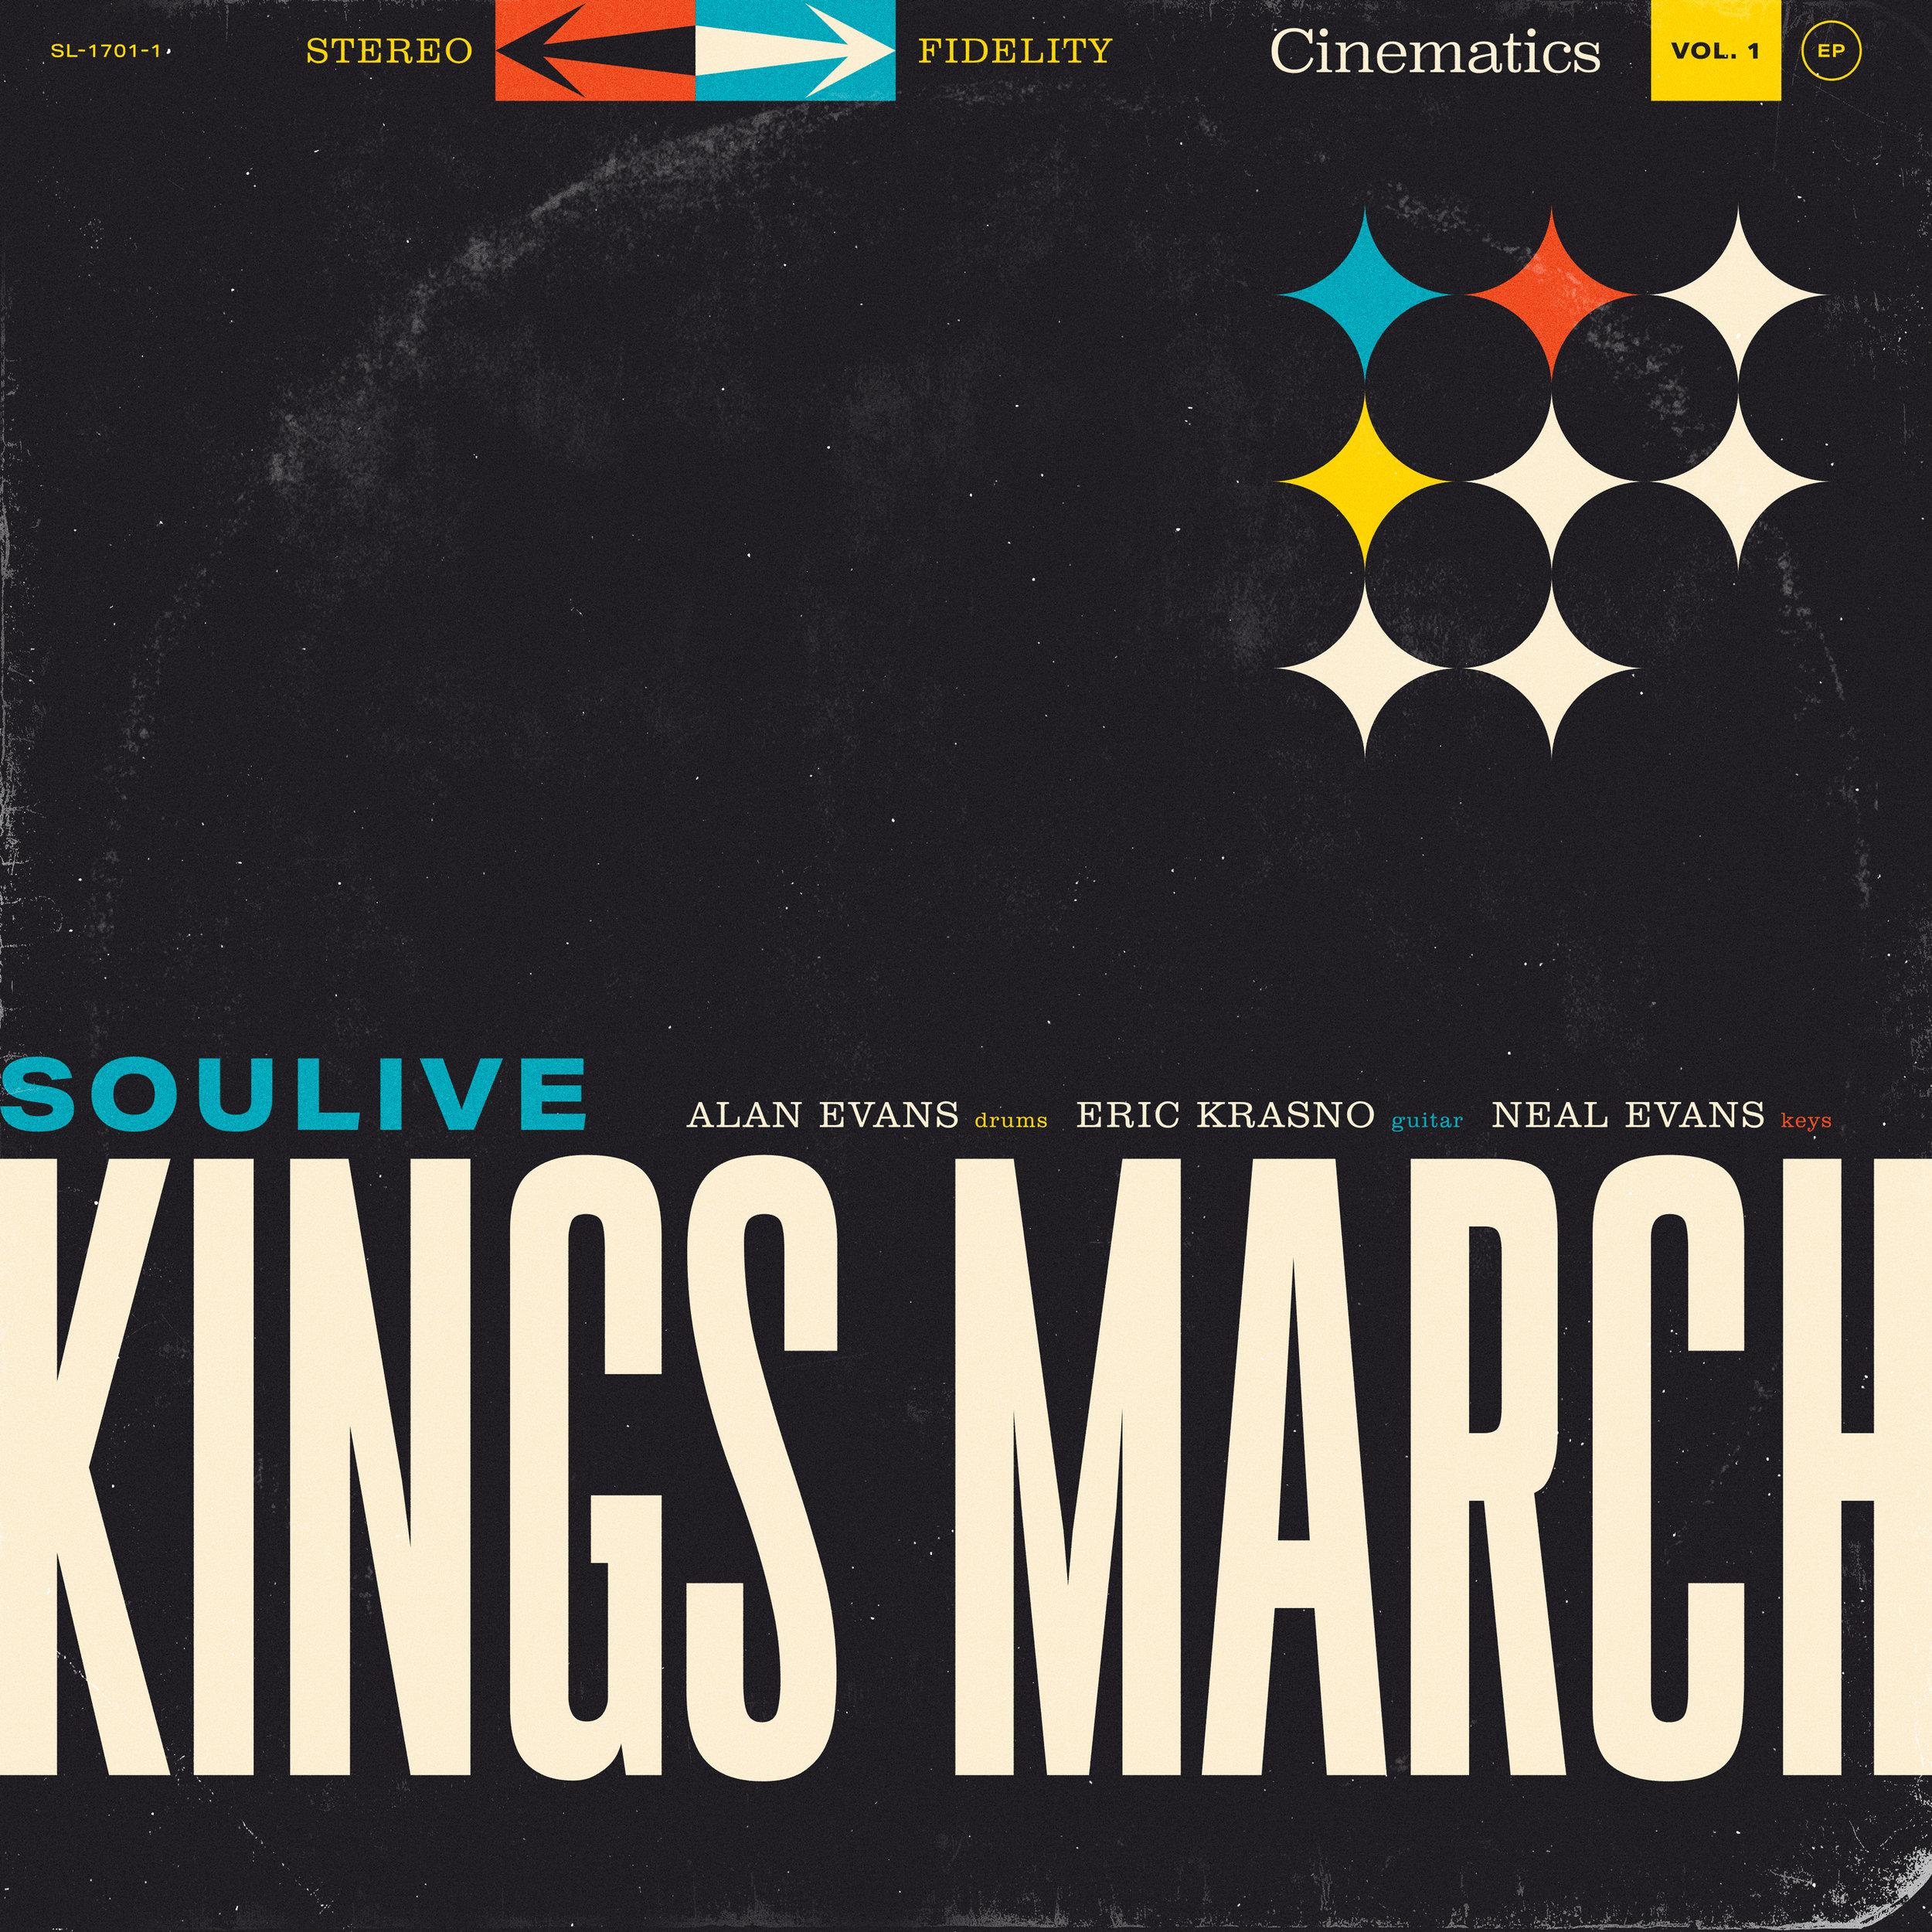 Soulive-Kings_March.jpg